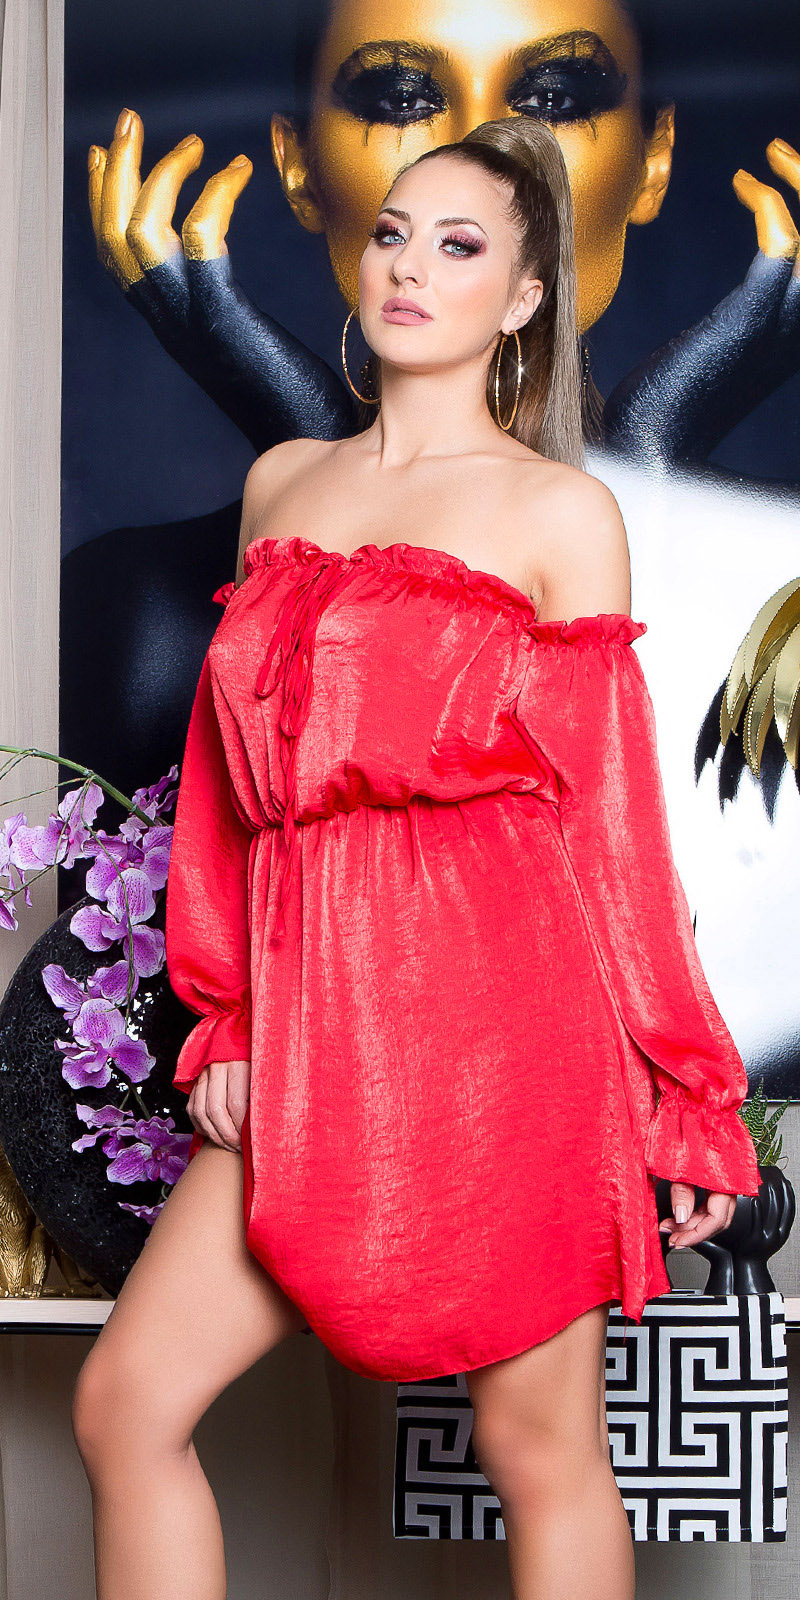 Sexy mini jurkje carmen halslijn satijn look rood